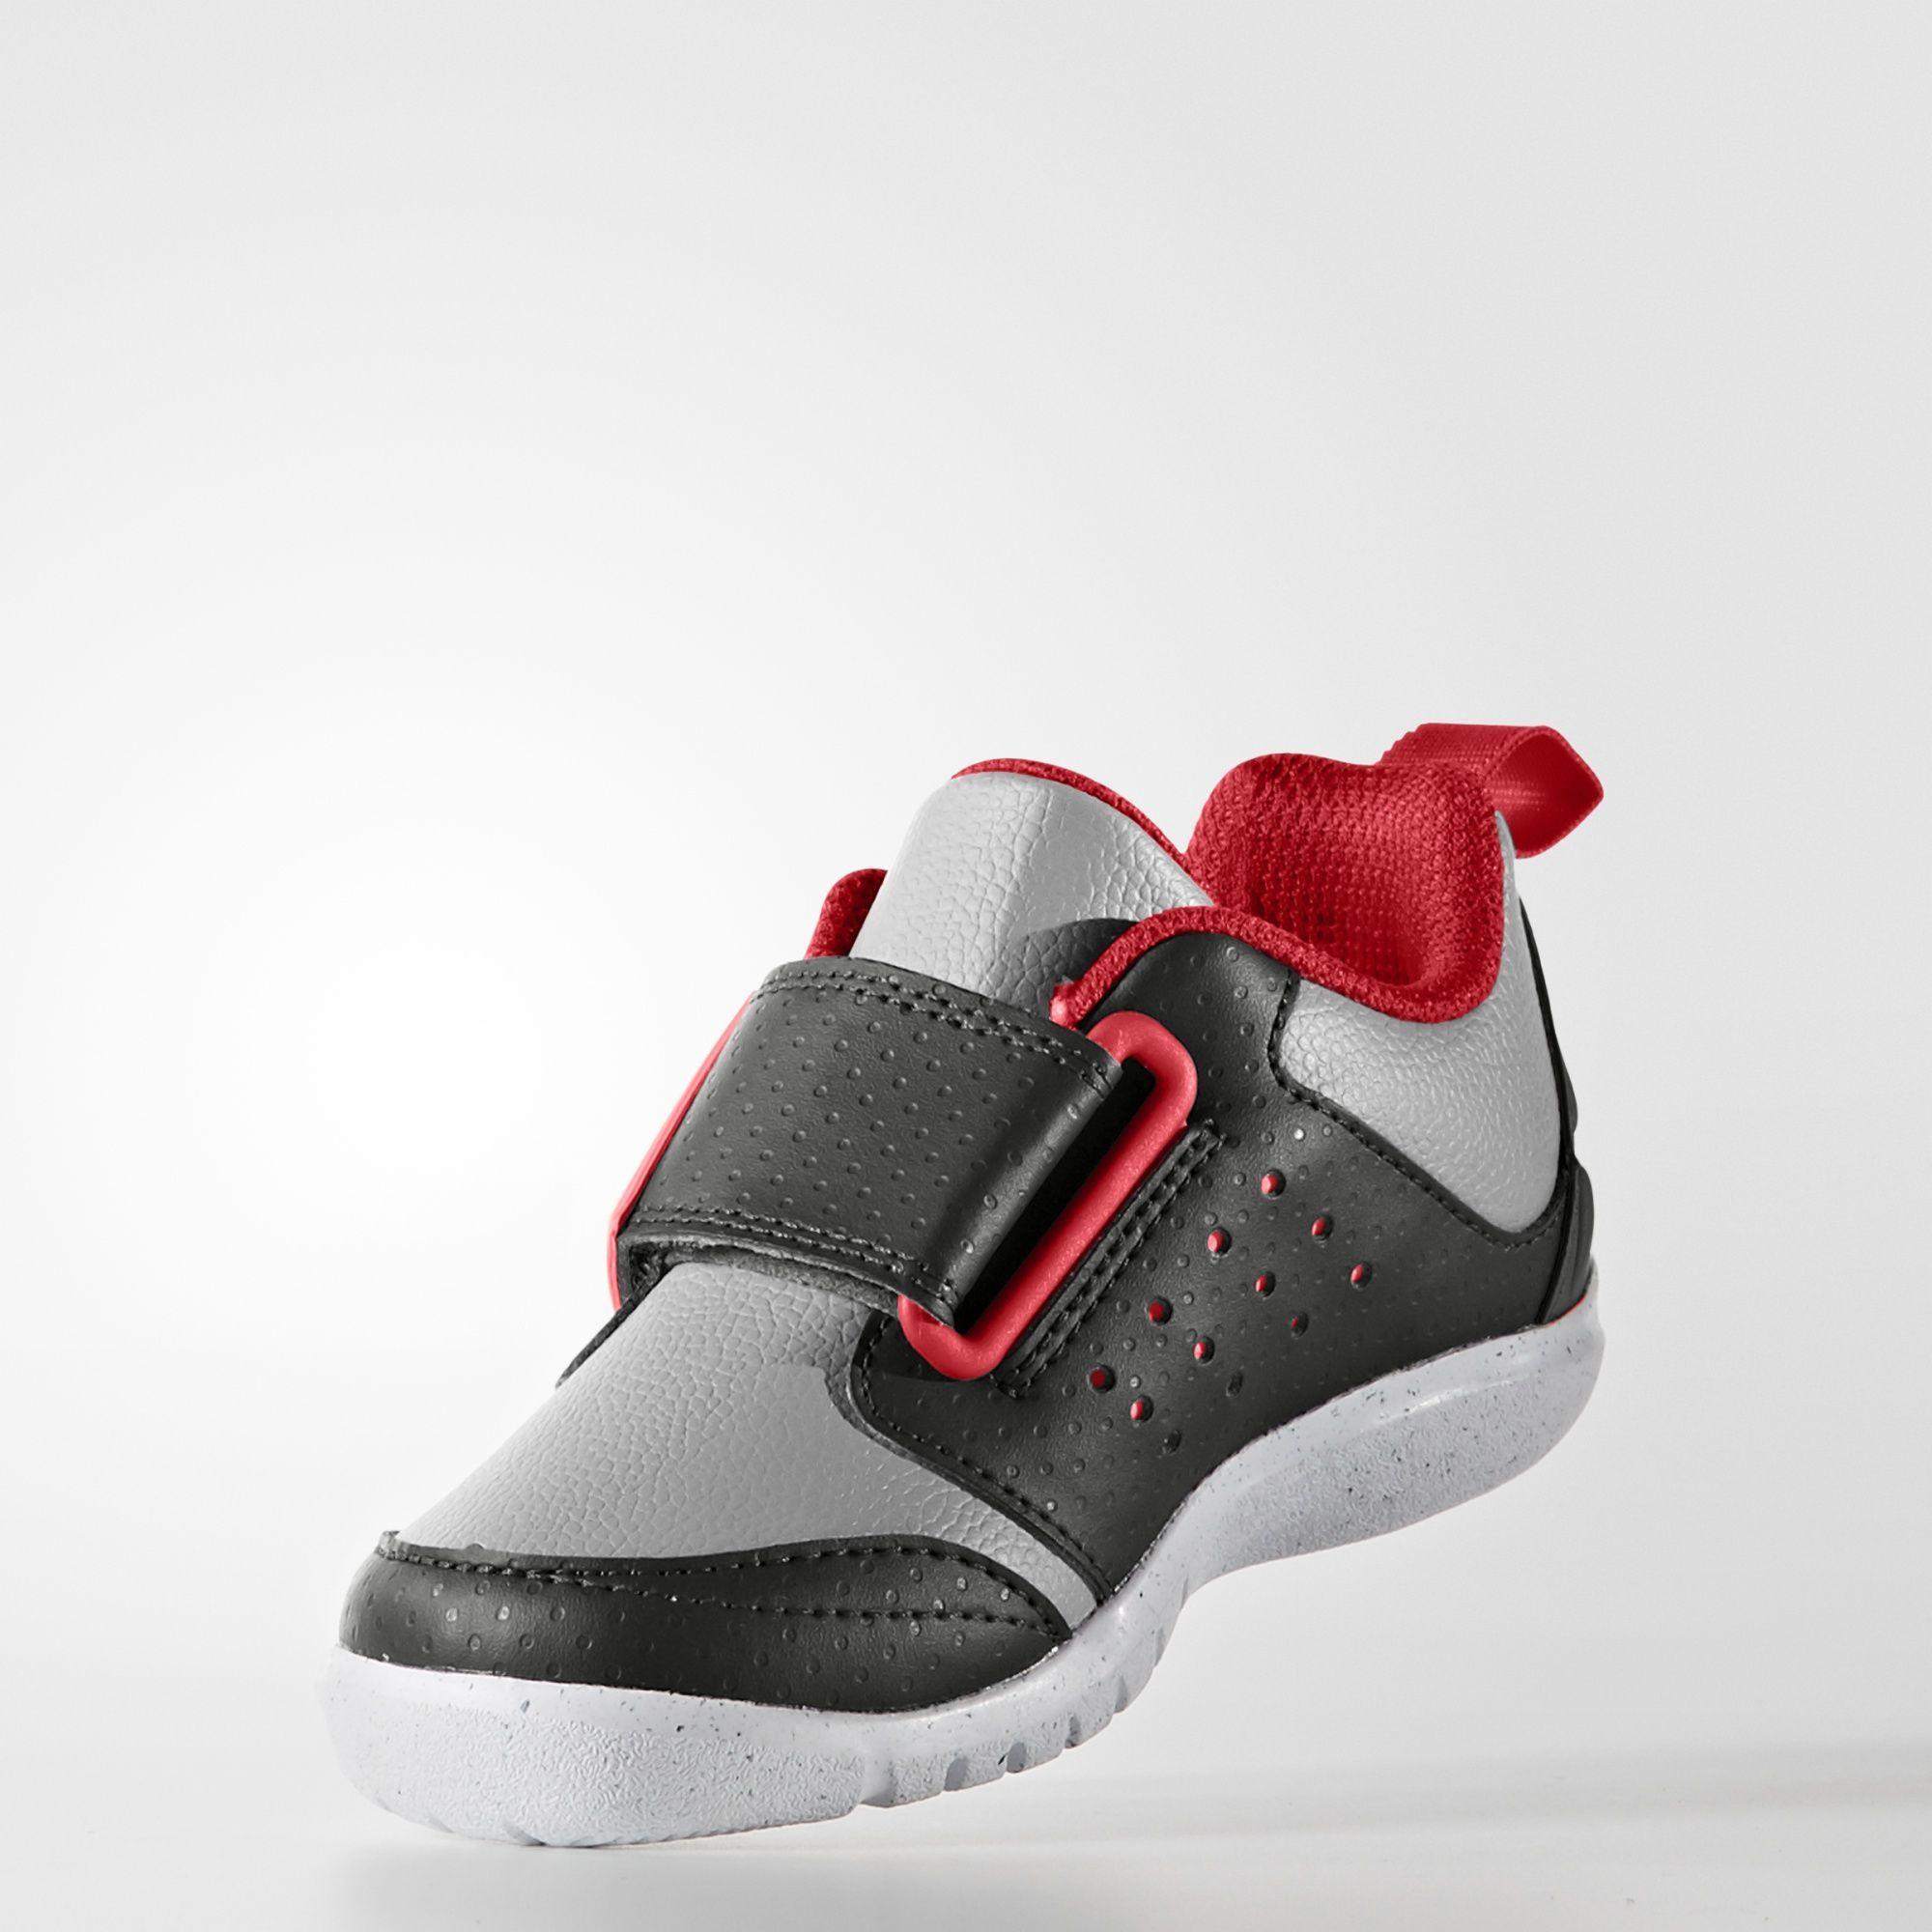 buy online 5f88f 6af04 adidas - FortaPlay Schuh